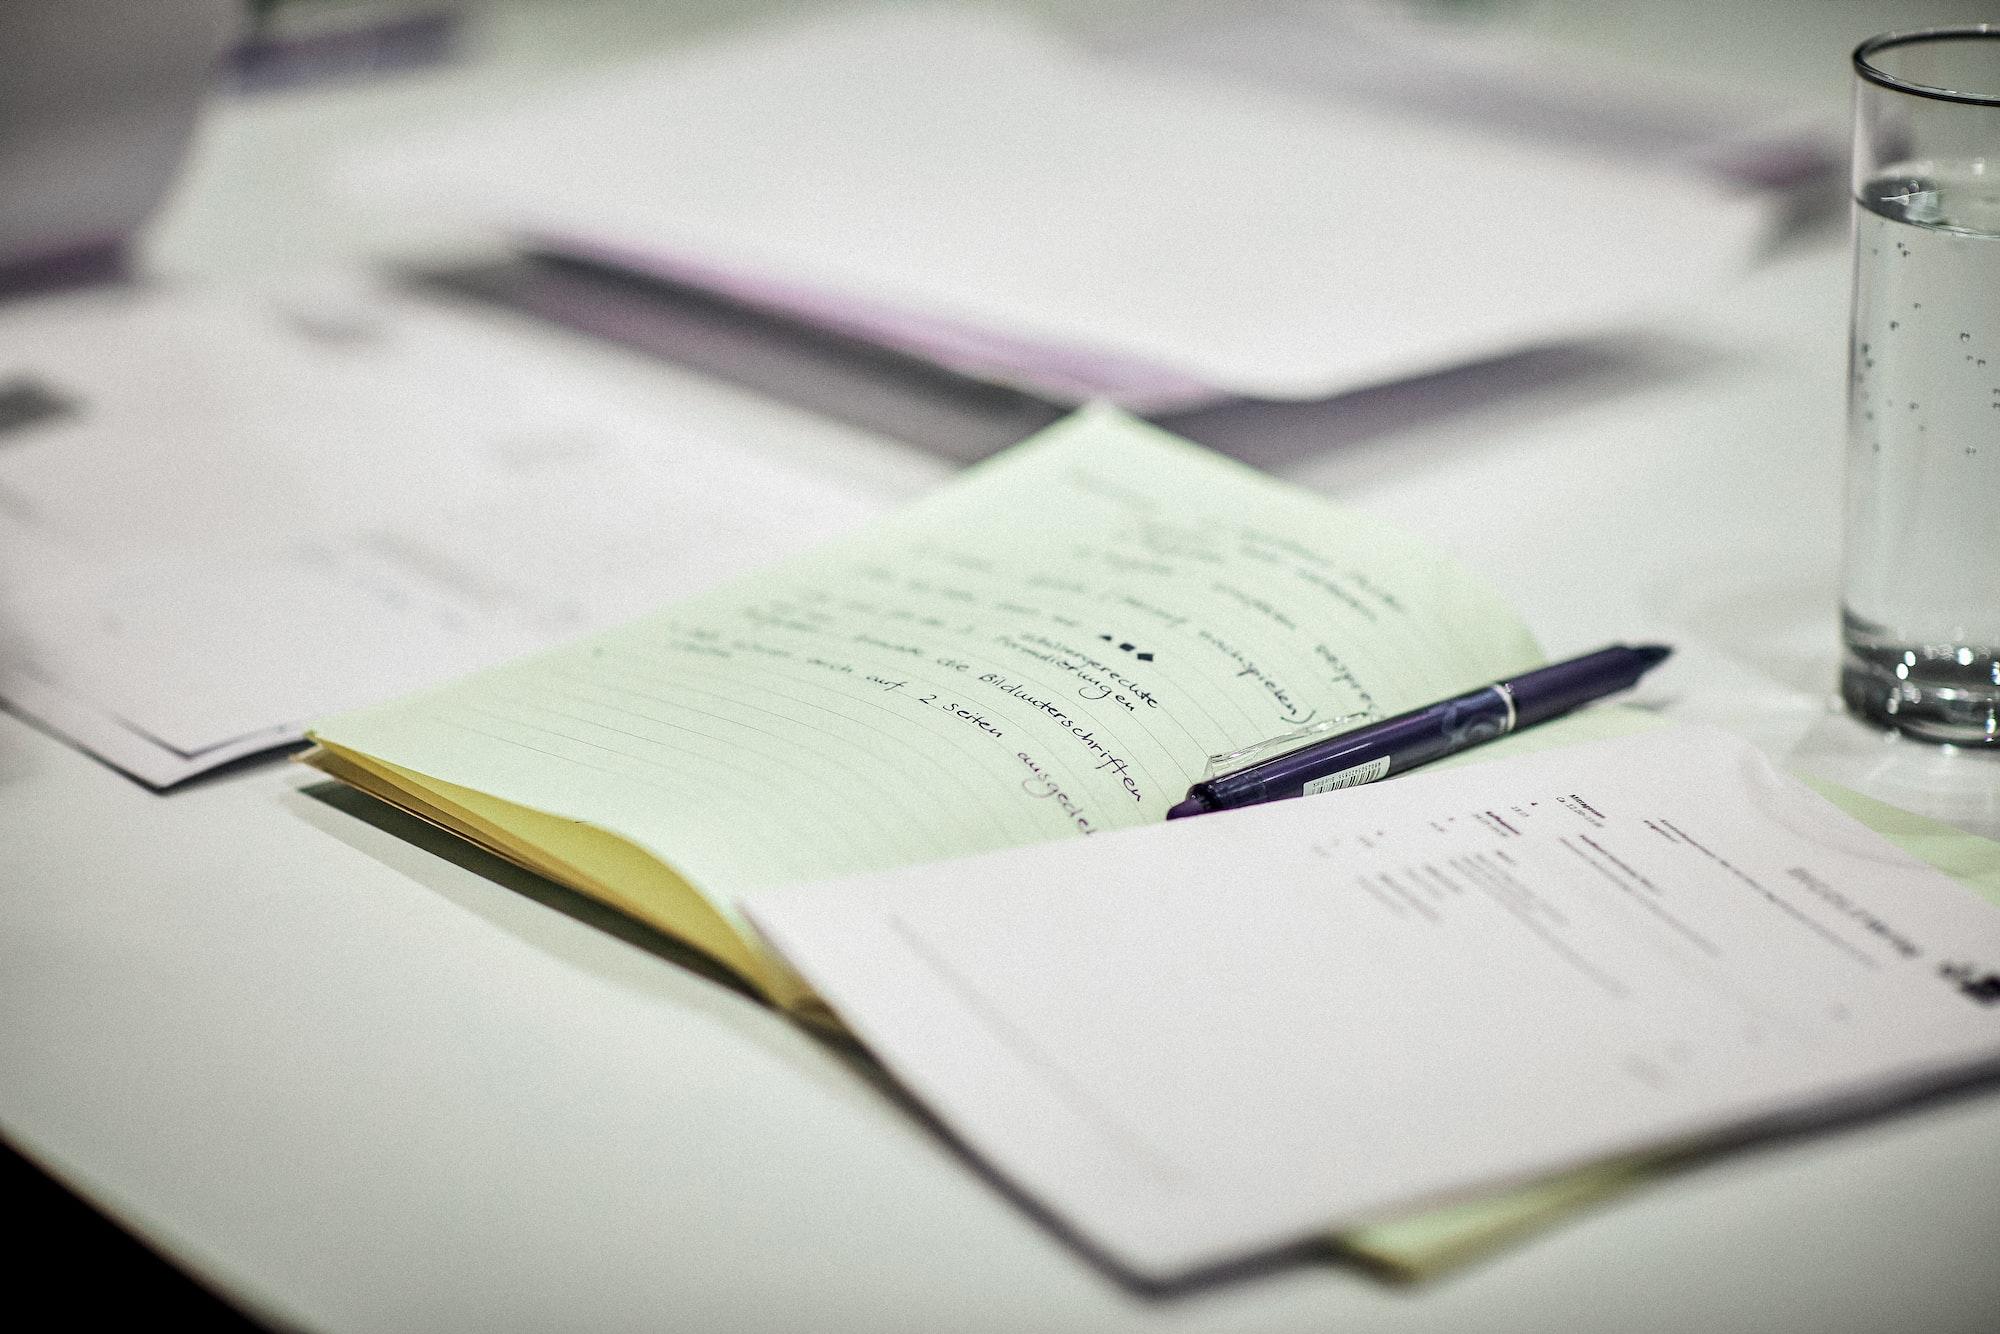 Note-Taking: Zettlekasten Method